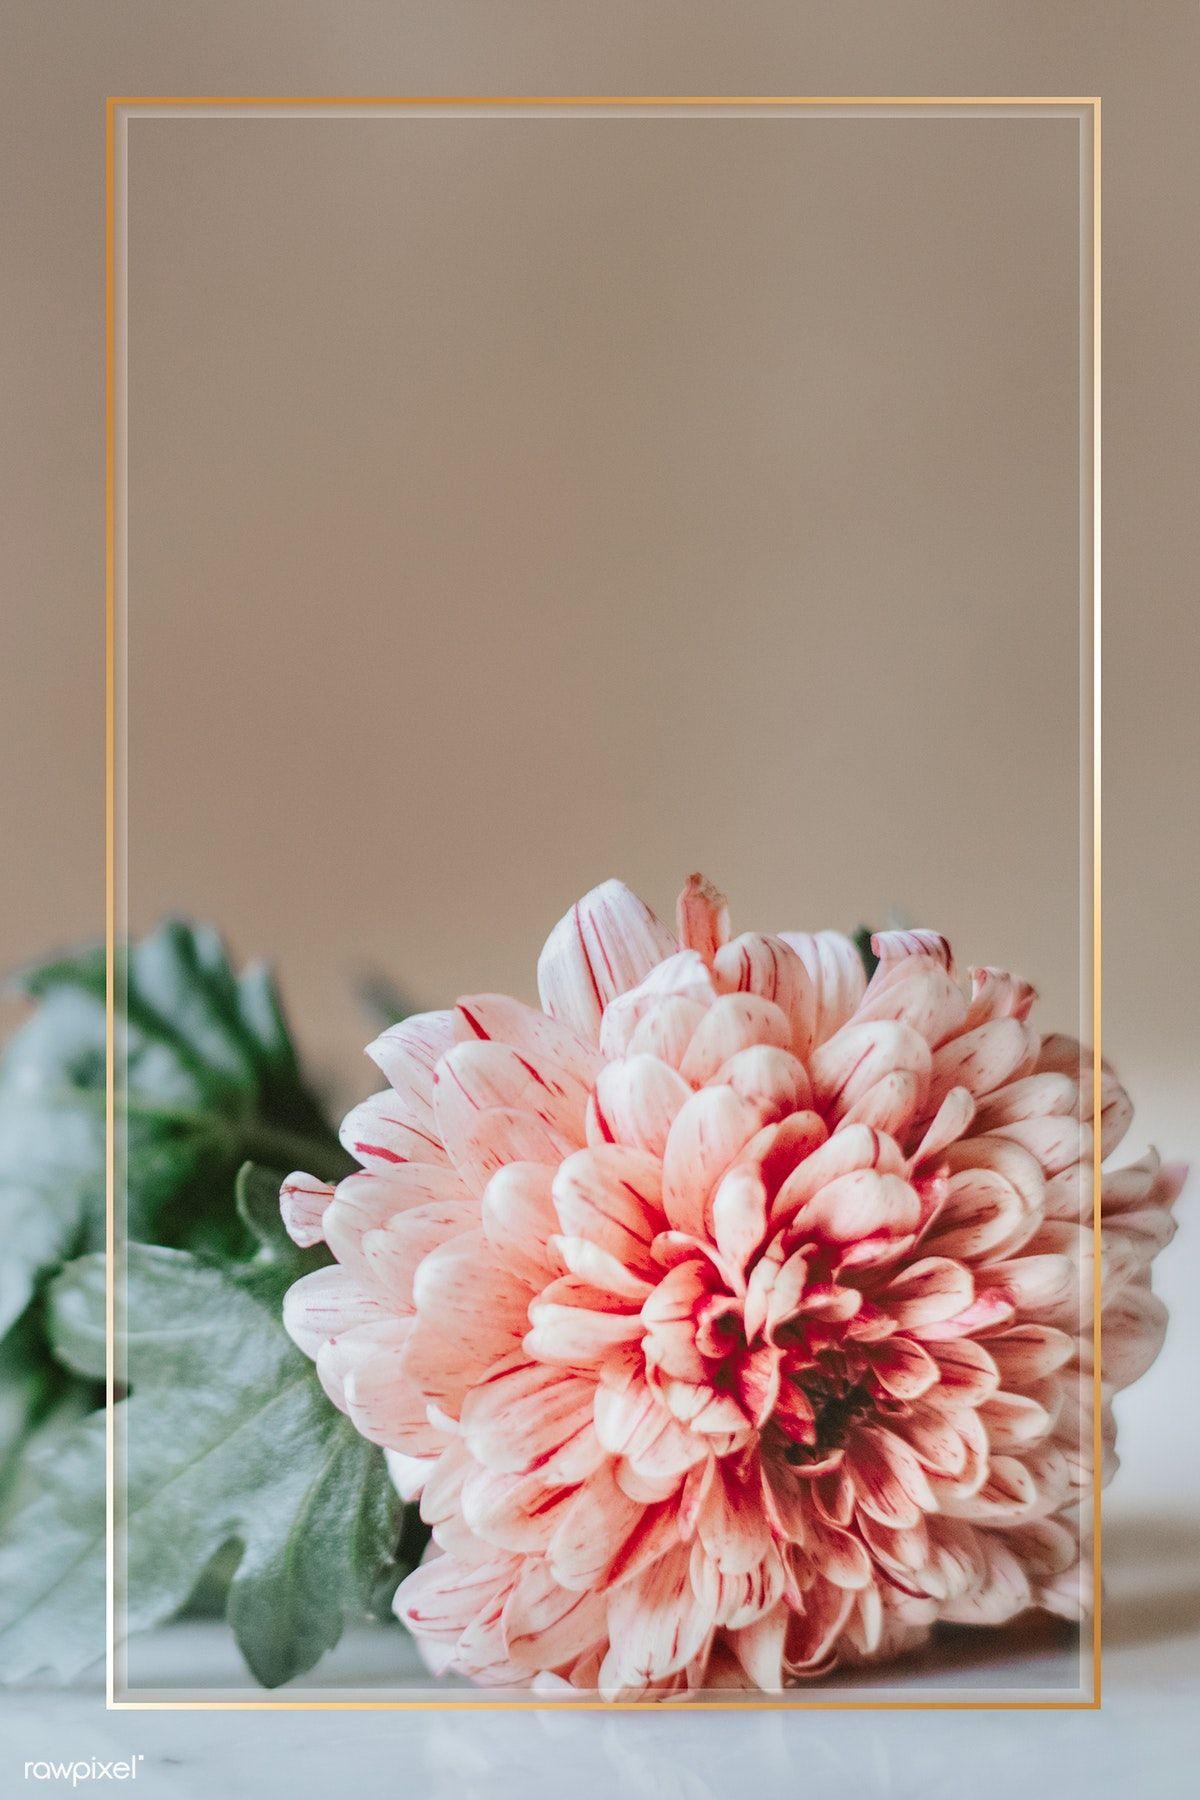 Download Premium Psd Of Chrysanthemum Pip Salmon On A White Table 1207794 Flower Background Wallpaper Flower Frame Flower Backgrounds Coolest chrysanthemum flower wallpaper